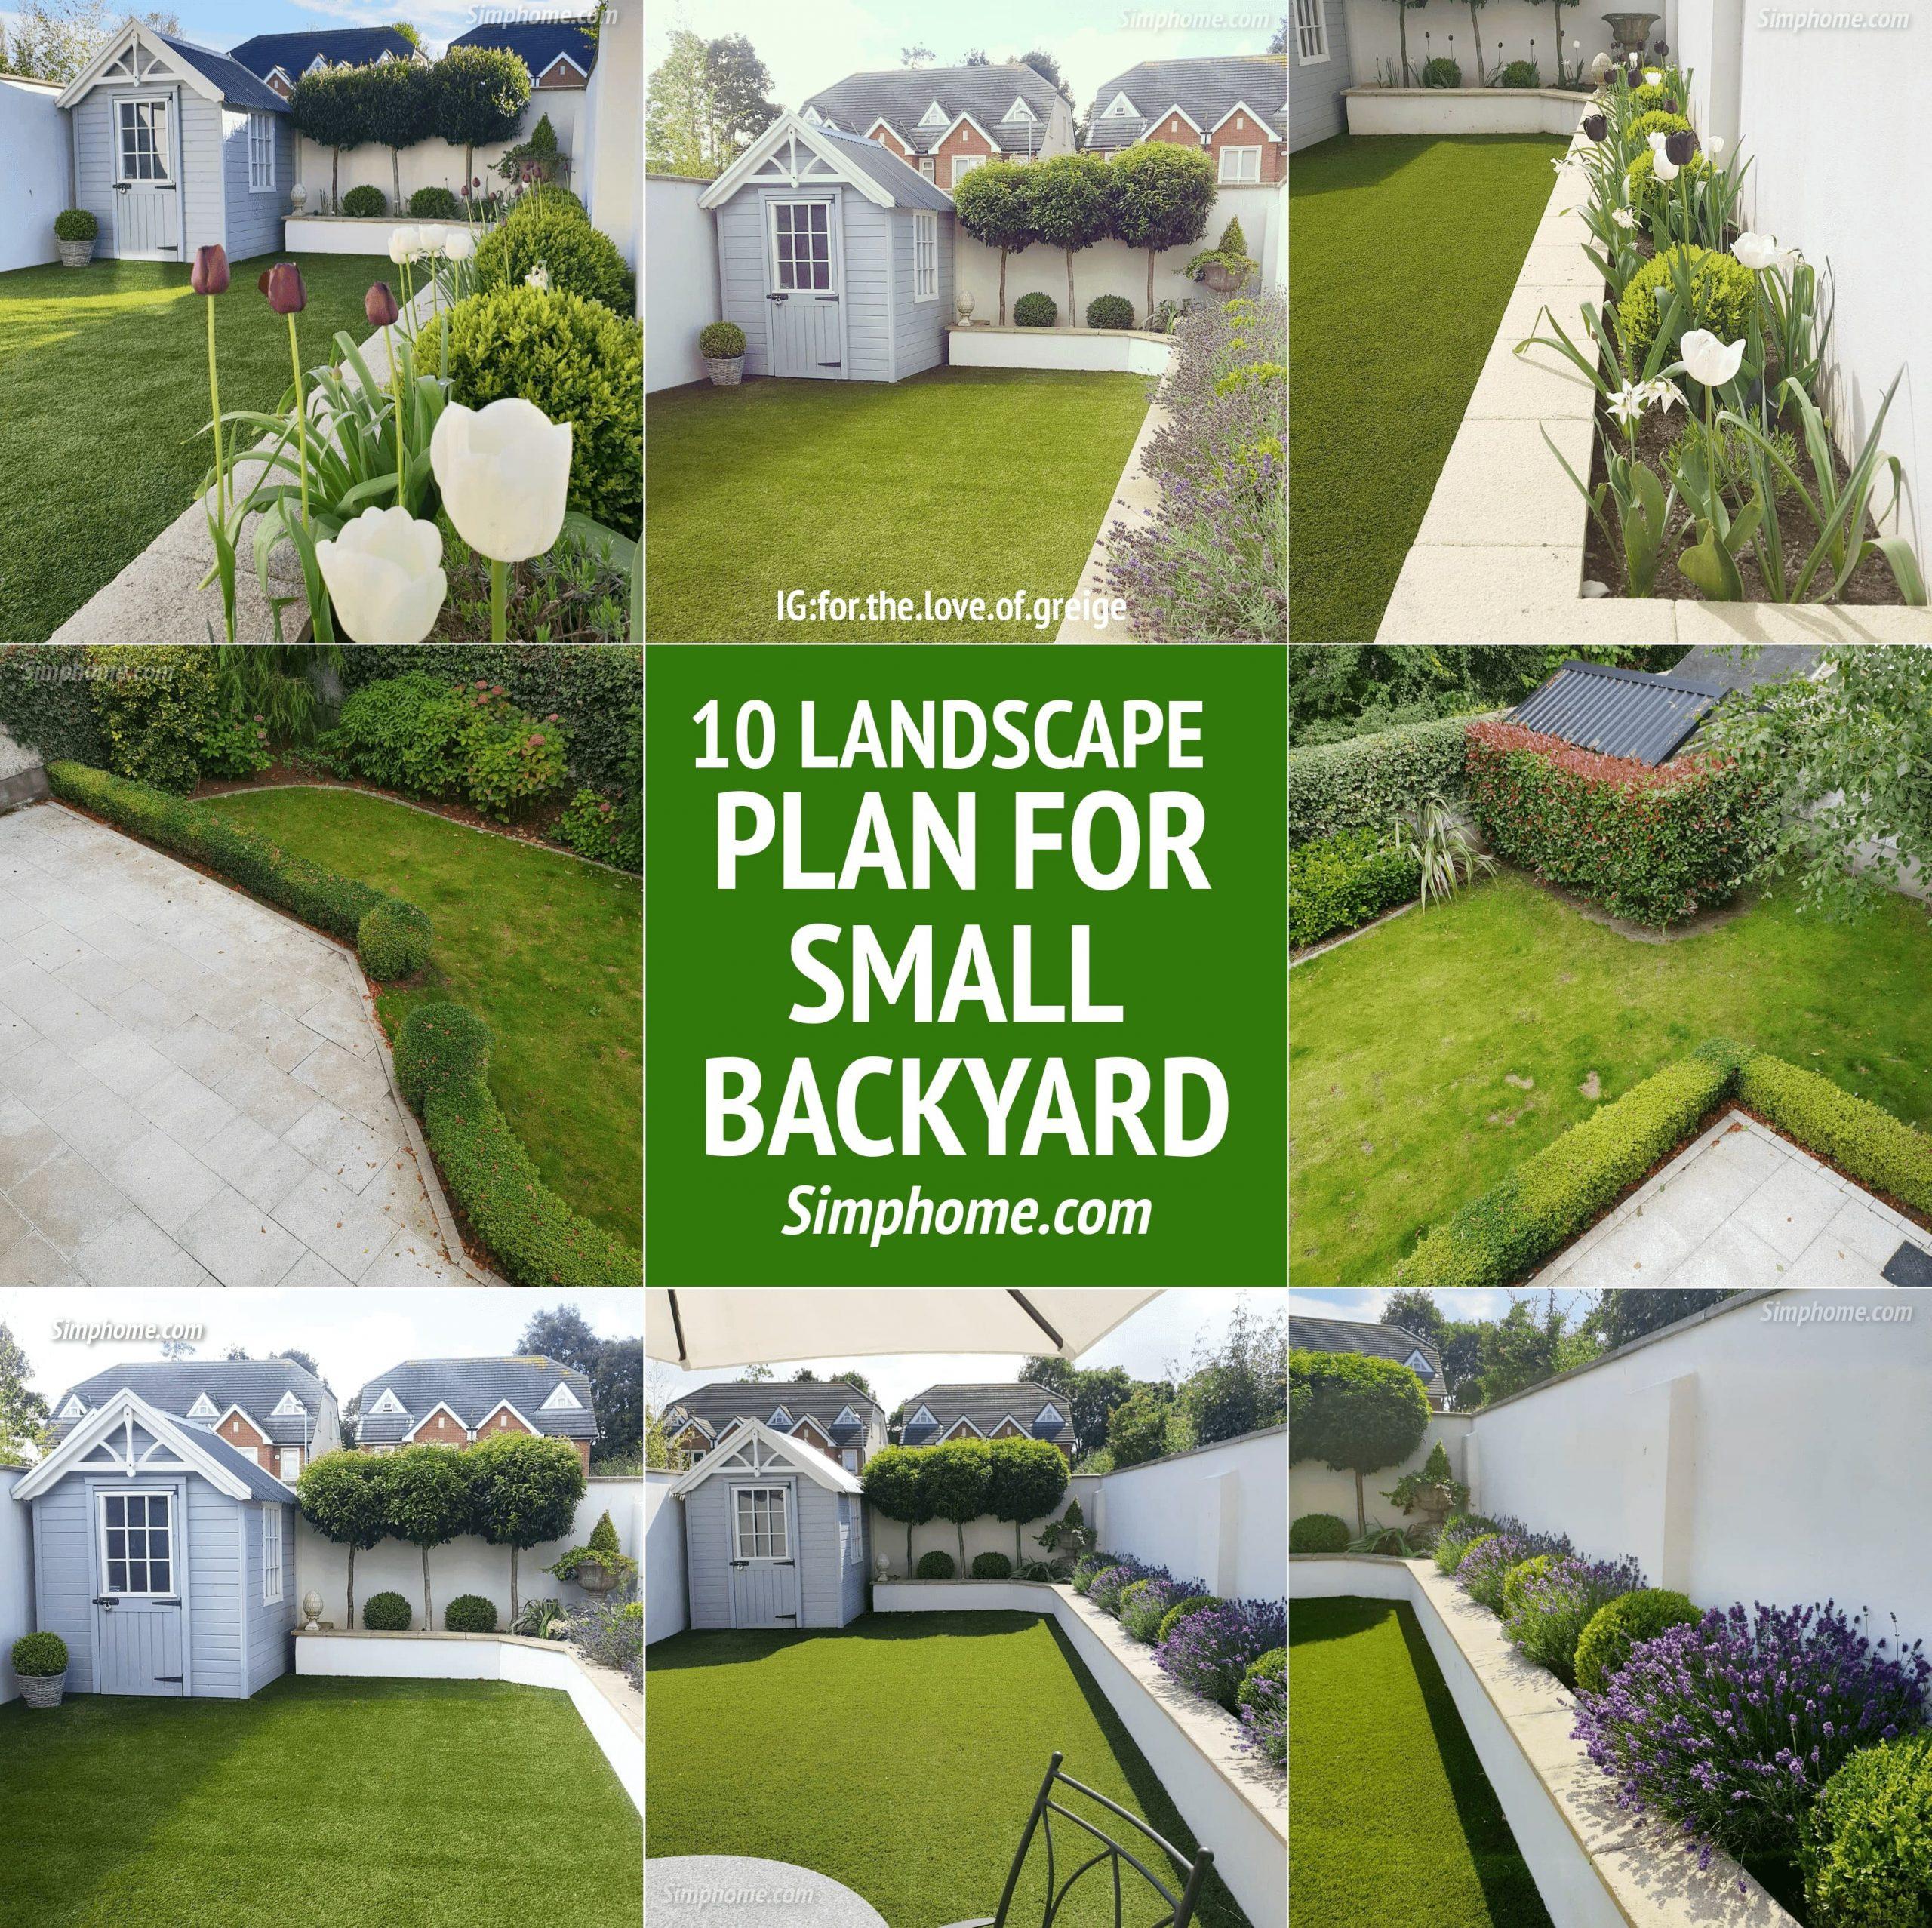 SIMPHOME.COM 10 Landscape Plan for Small Backyard